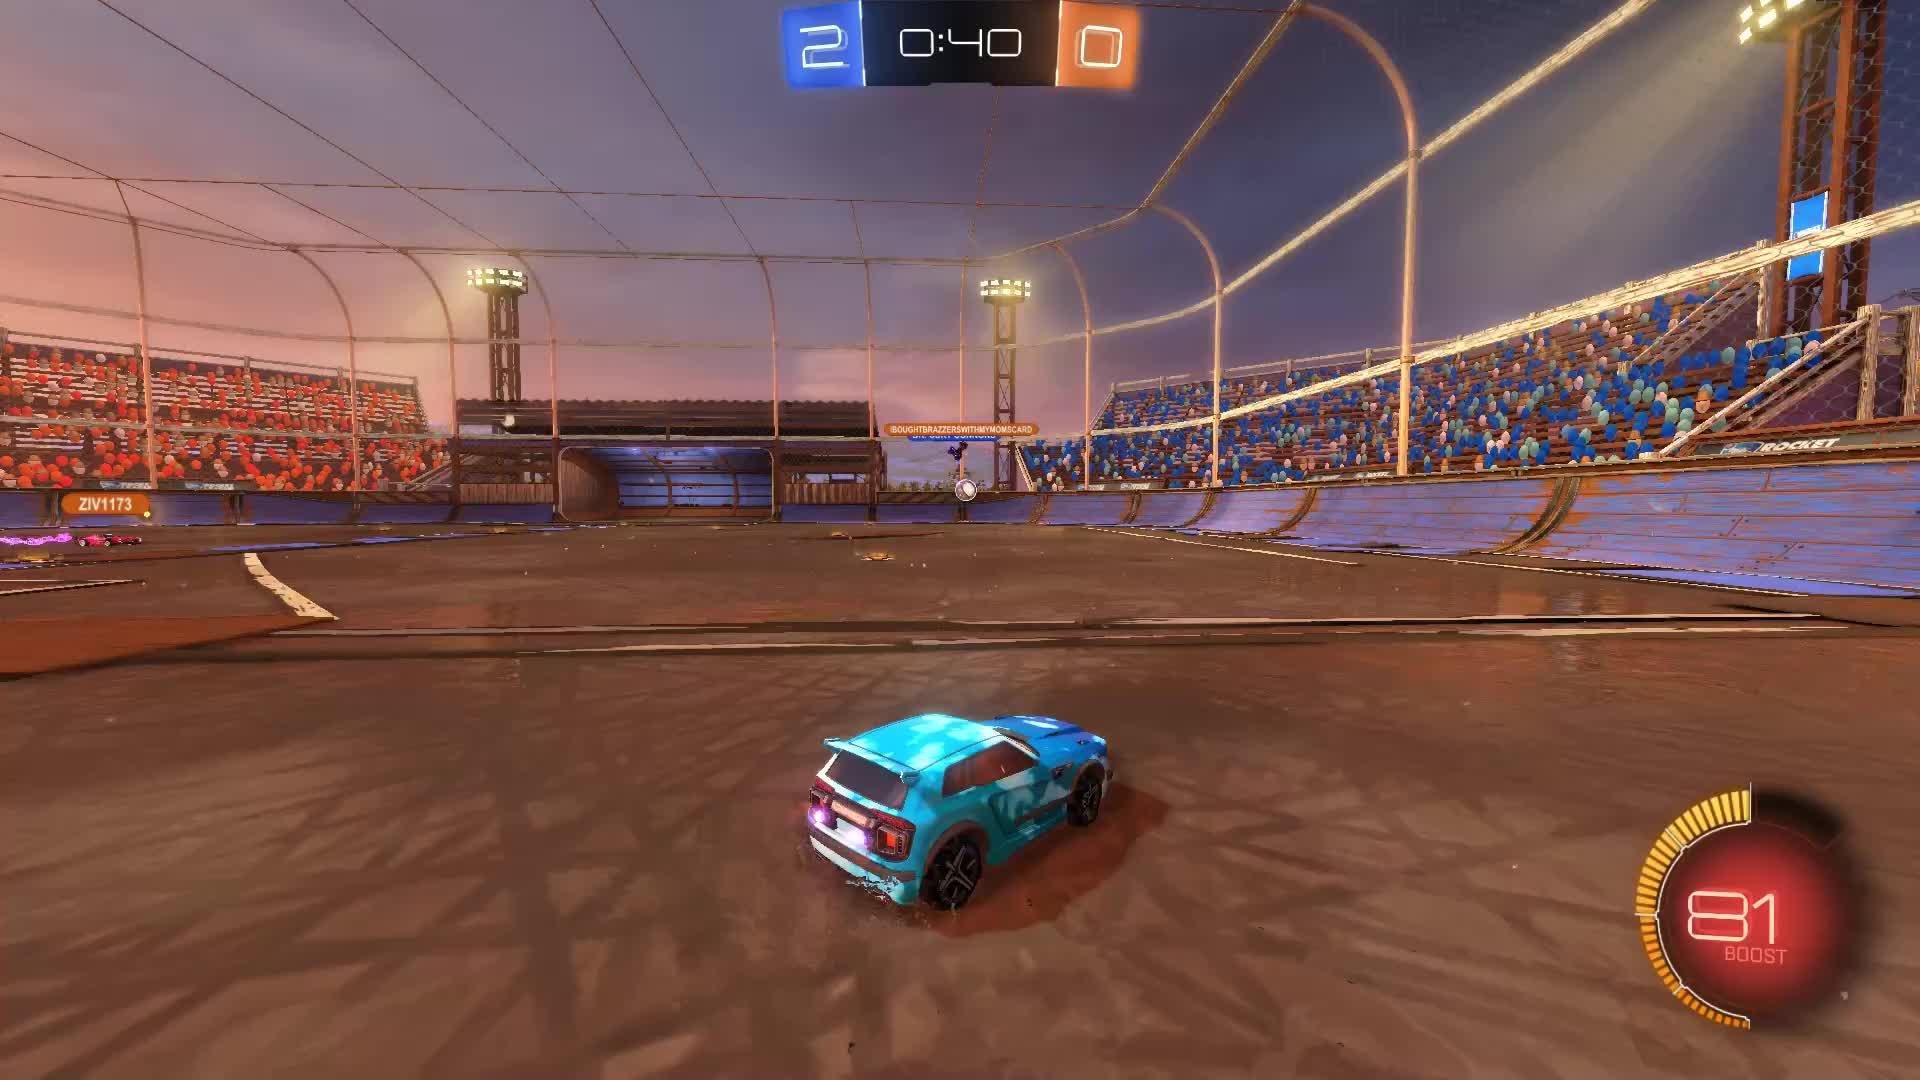 Aero, Gif Your Game, GifYourGame, Goal, Rocket League, RocketLeague, Goal 3: Aero GIFs